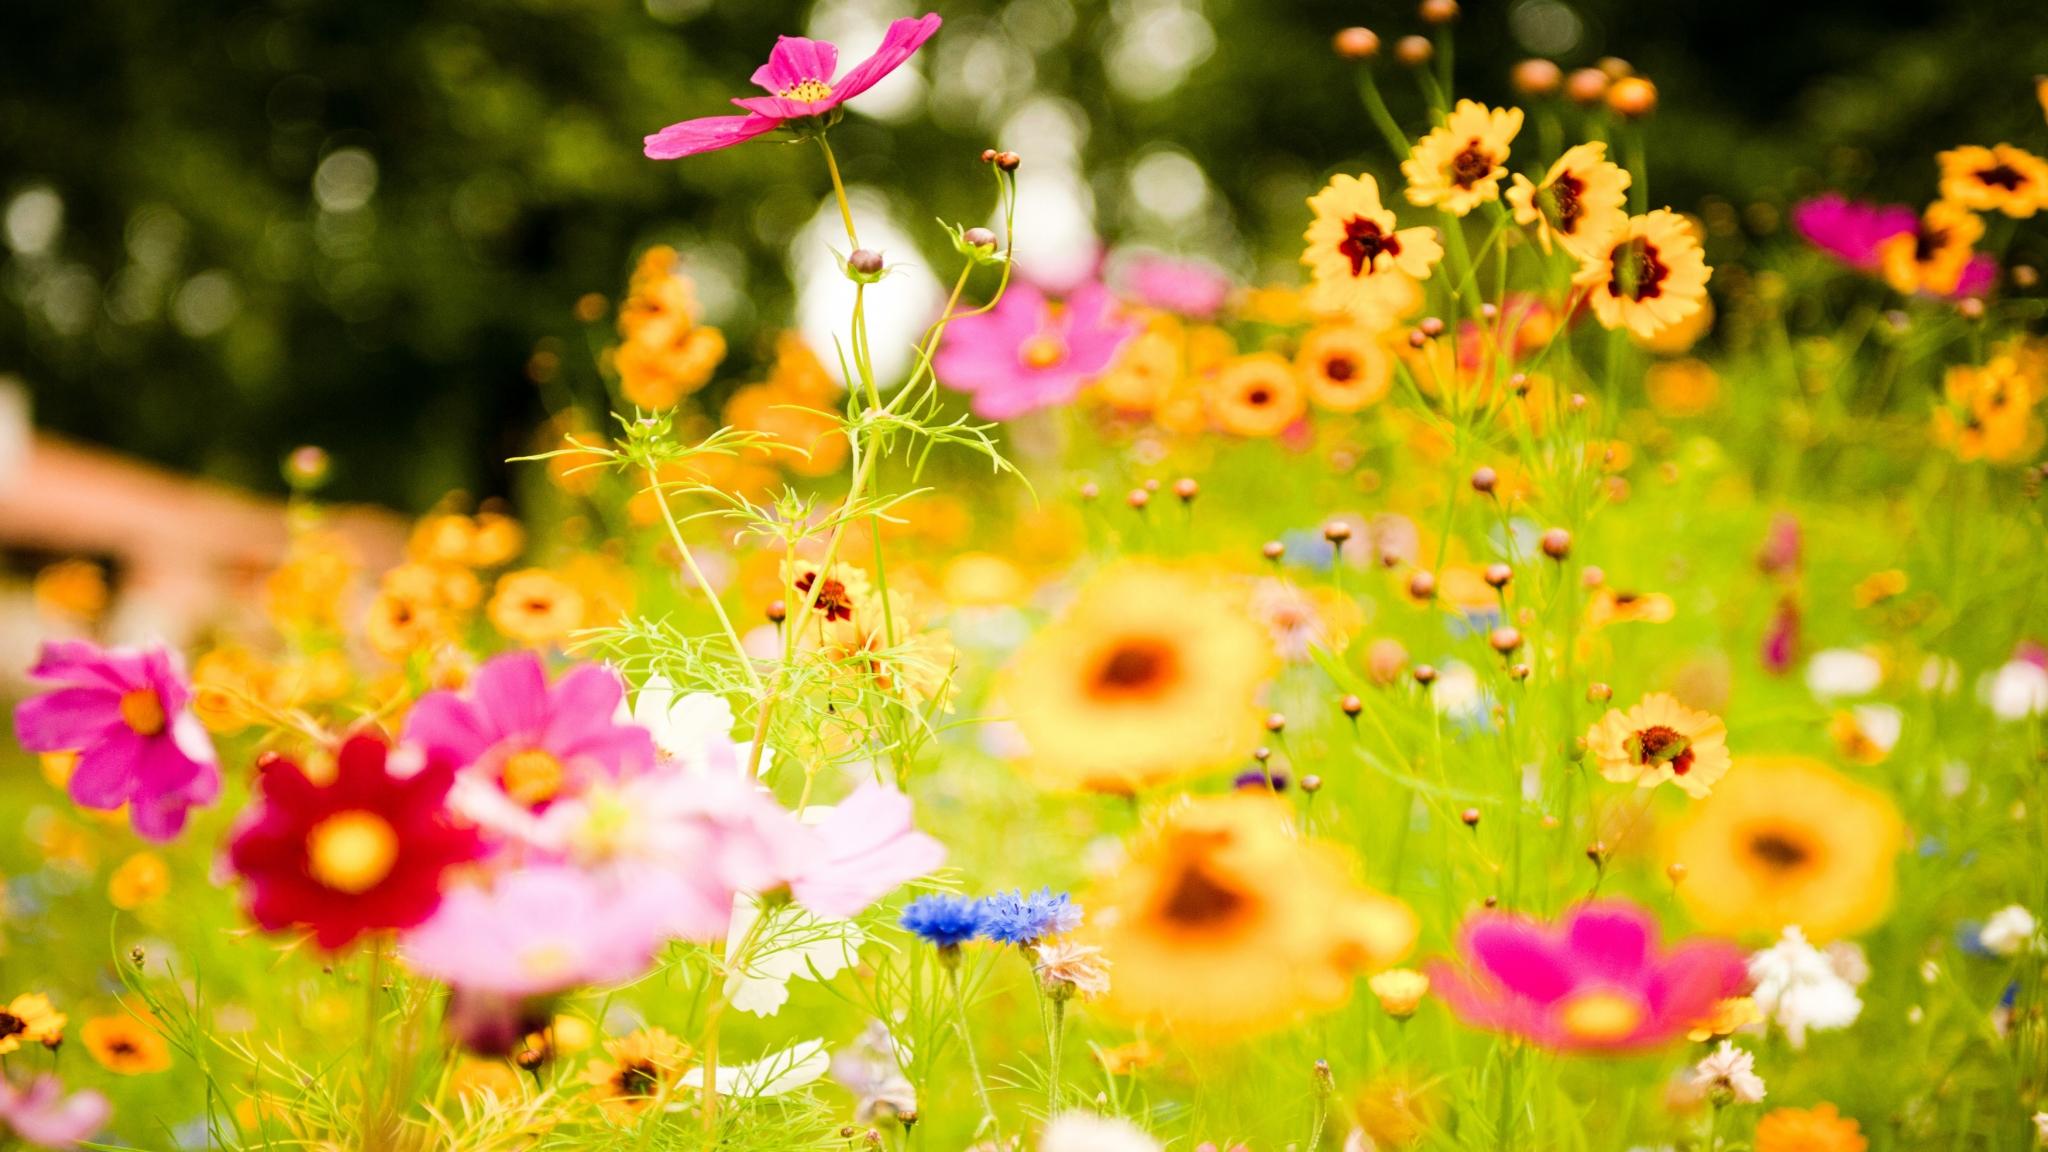 Download 2048x1152 Vivid Flowers Hd HD Wallpaper